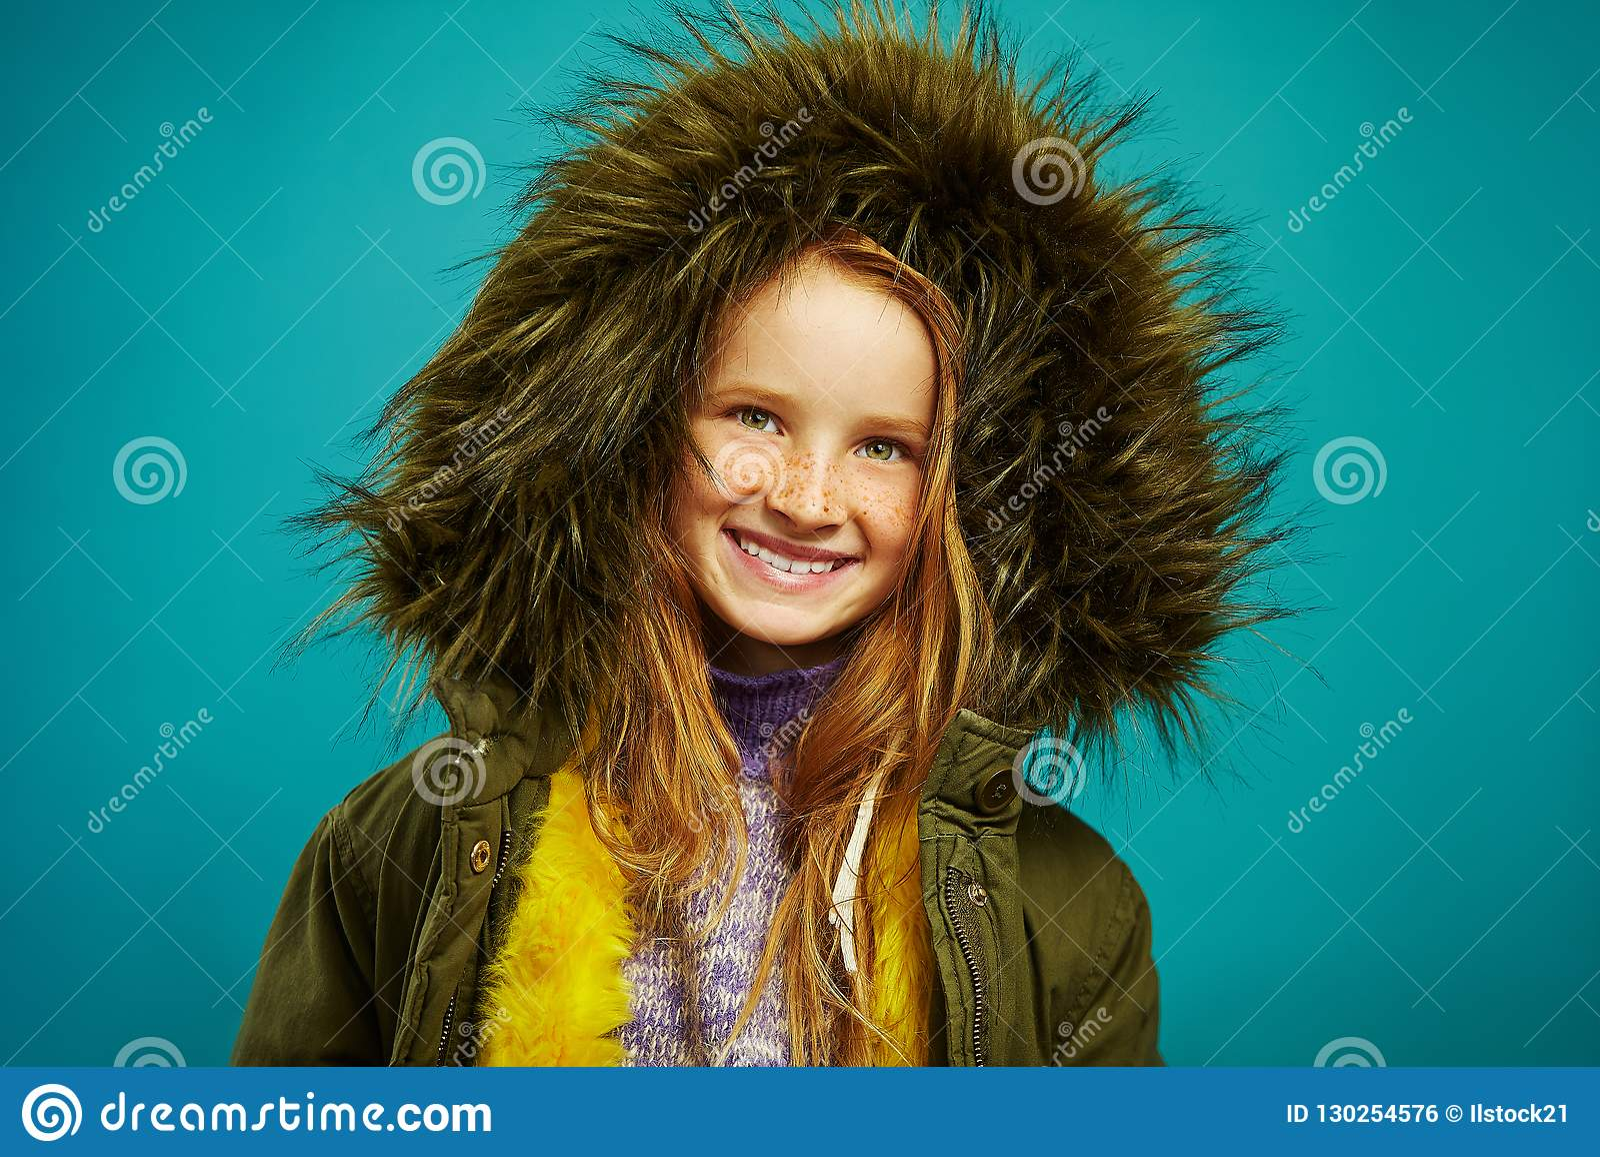 Joyful children girl in demi season winter jacket isolated on blue background. Smiling teenage child expresses sincere